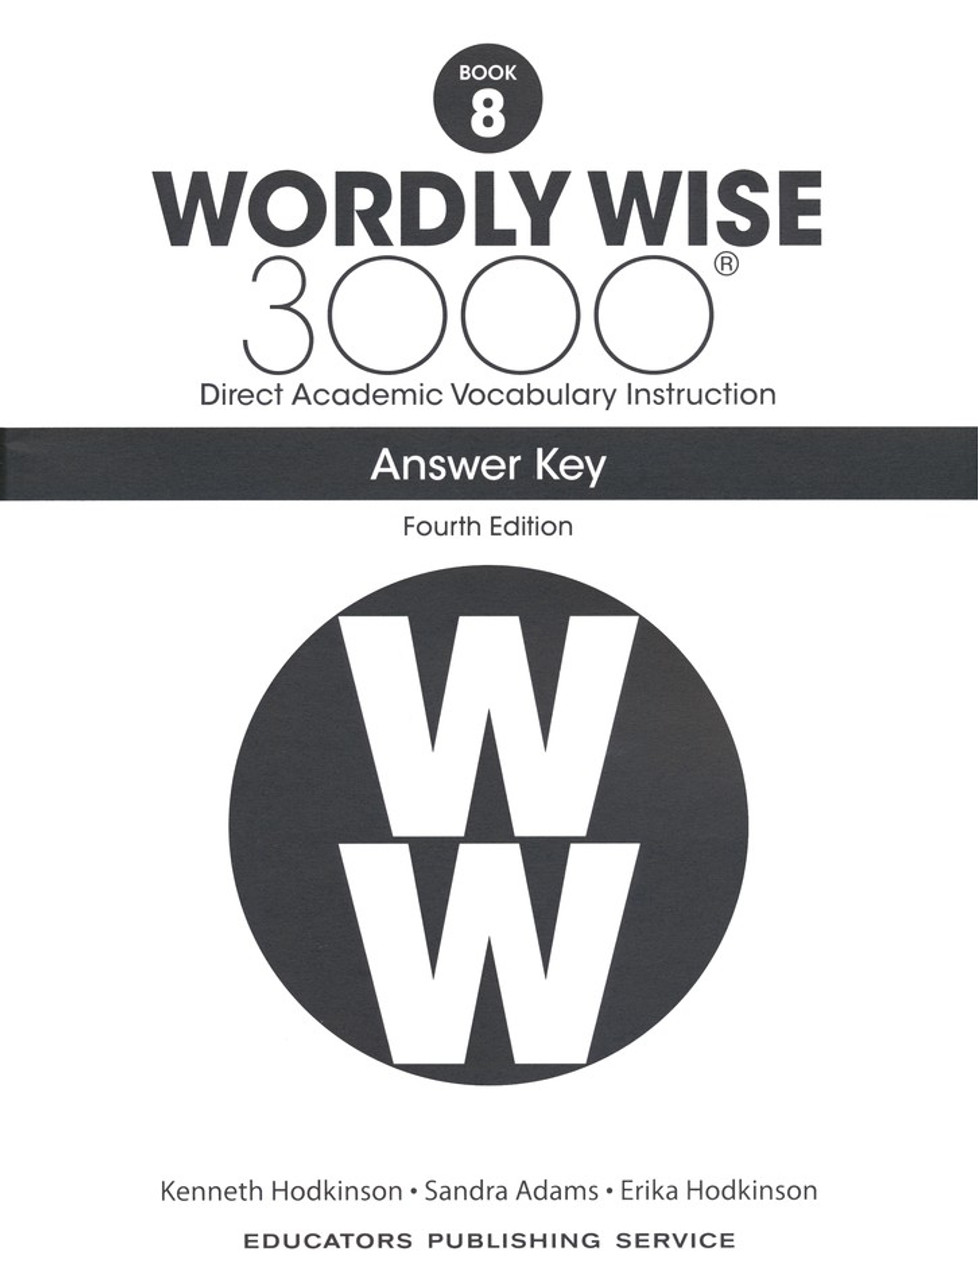 Ww 3000 Book 8 Lesson 13 Answers